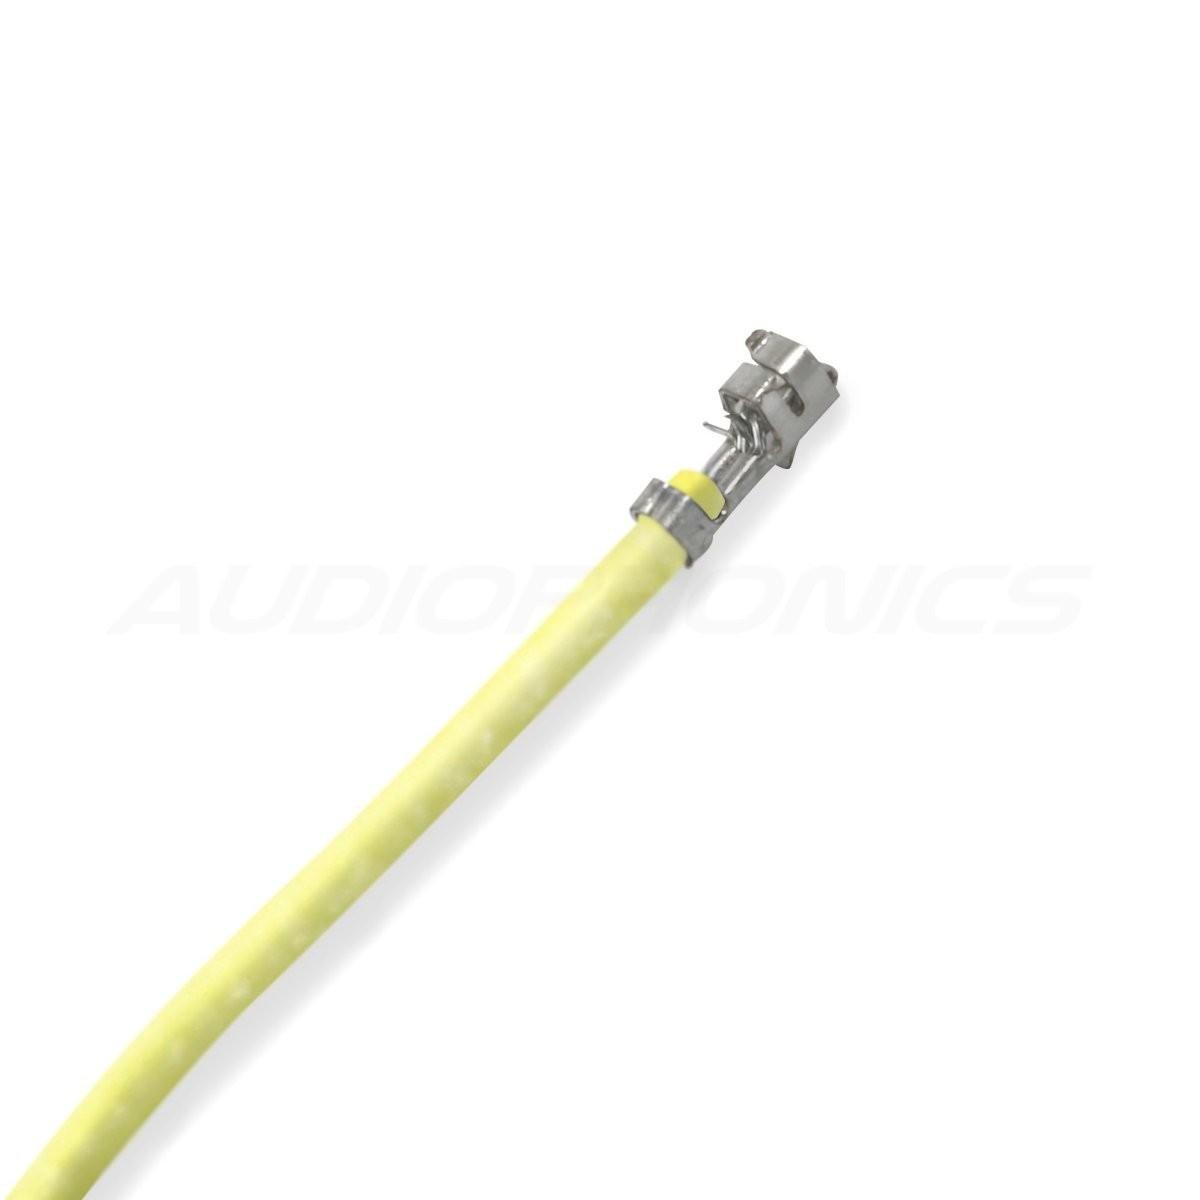 Câble XH 2.54mm Femelle / Femelle Sans Boîtier Jaune 15cm (x10)